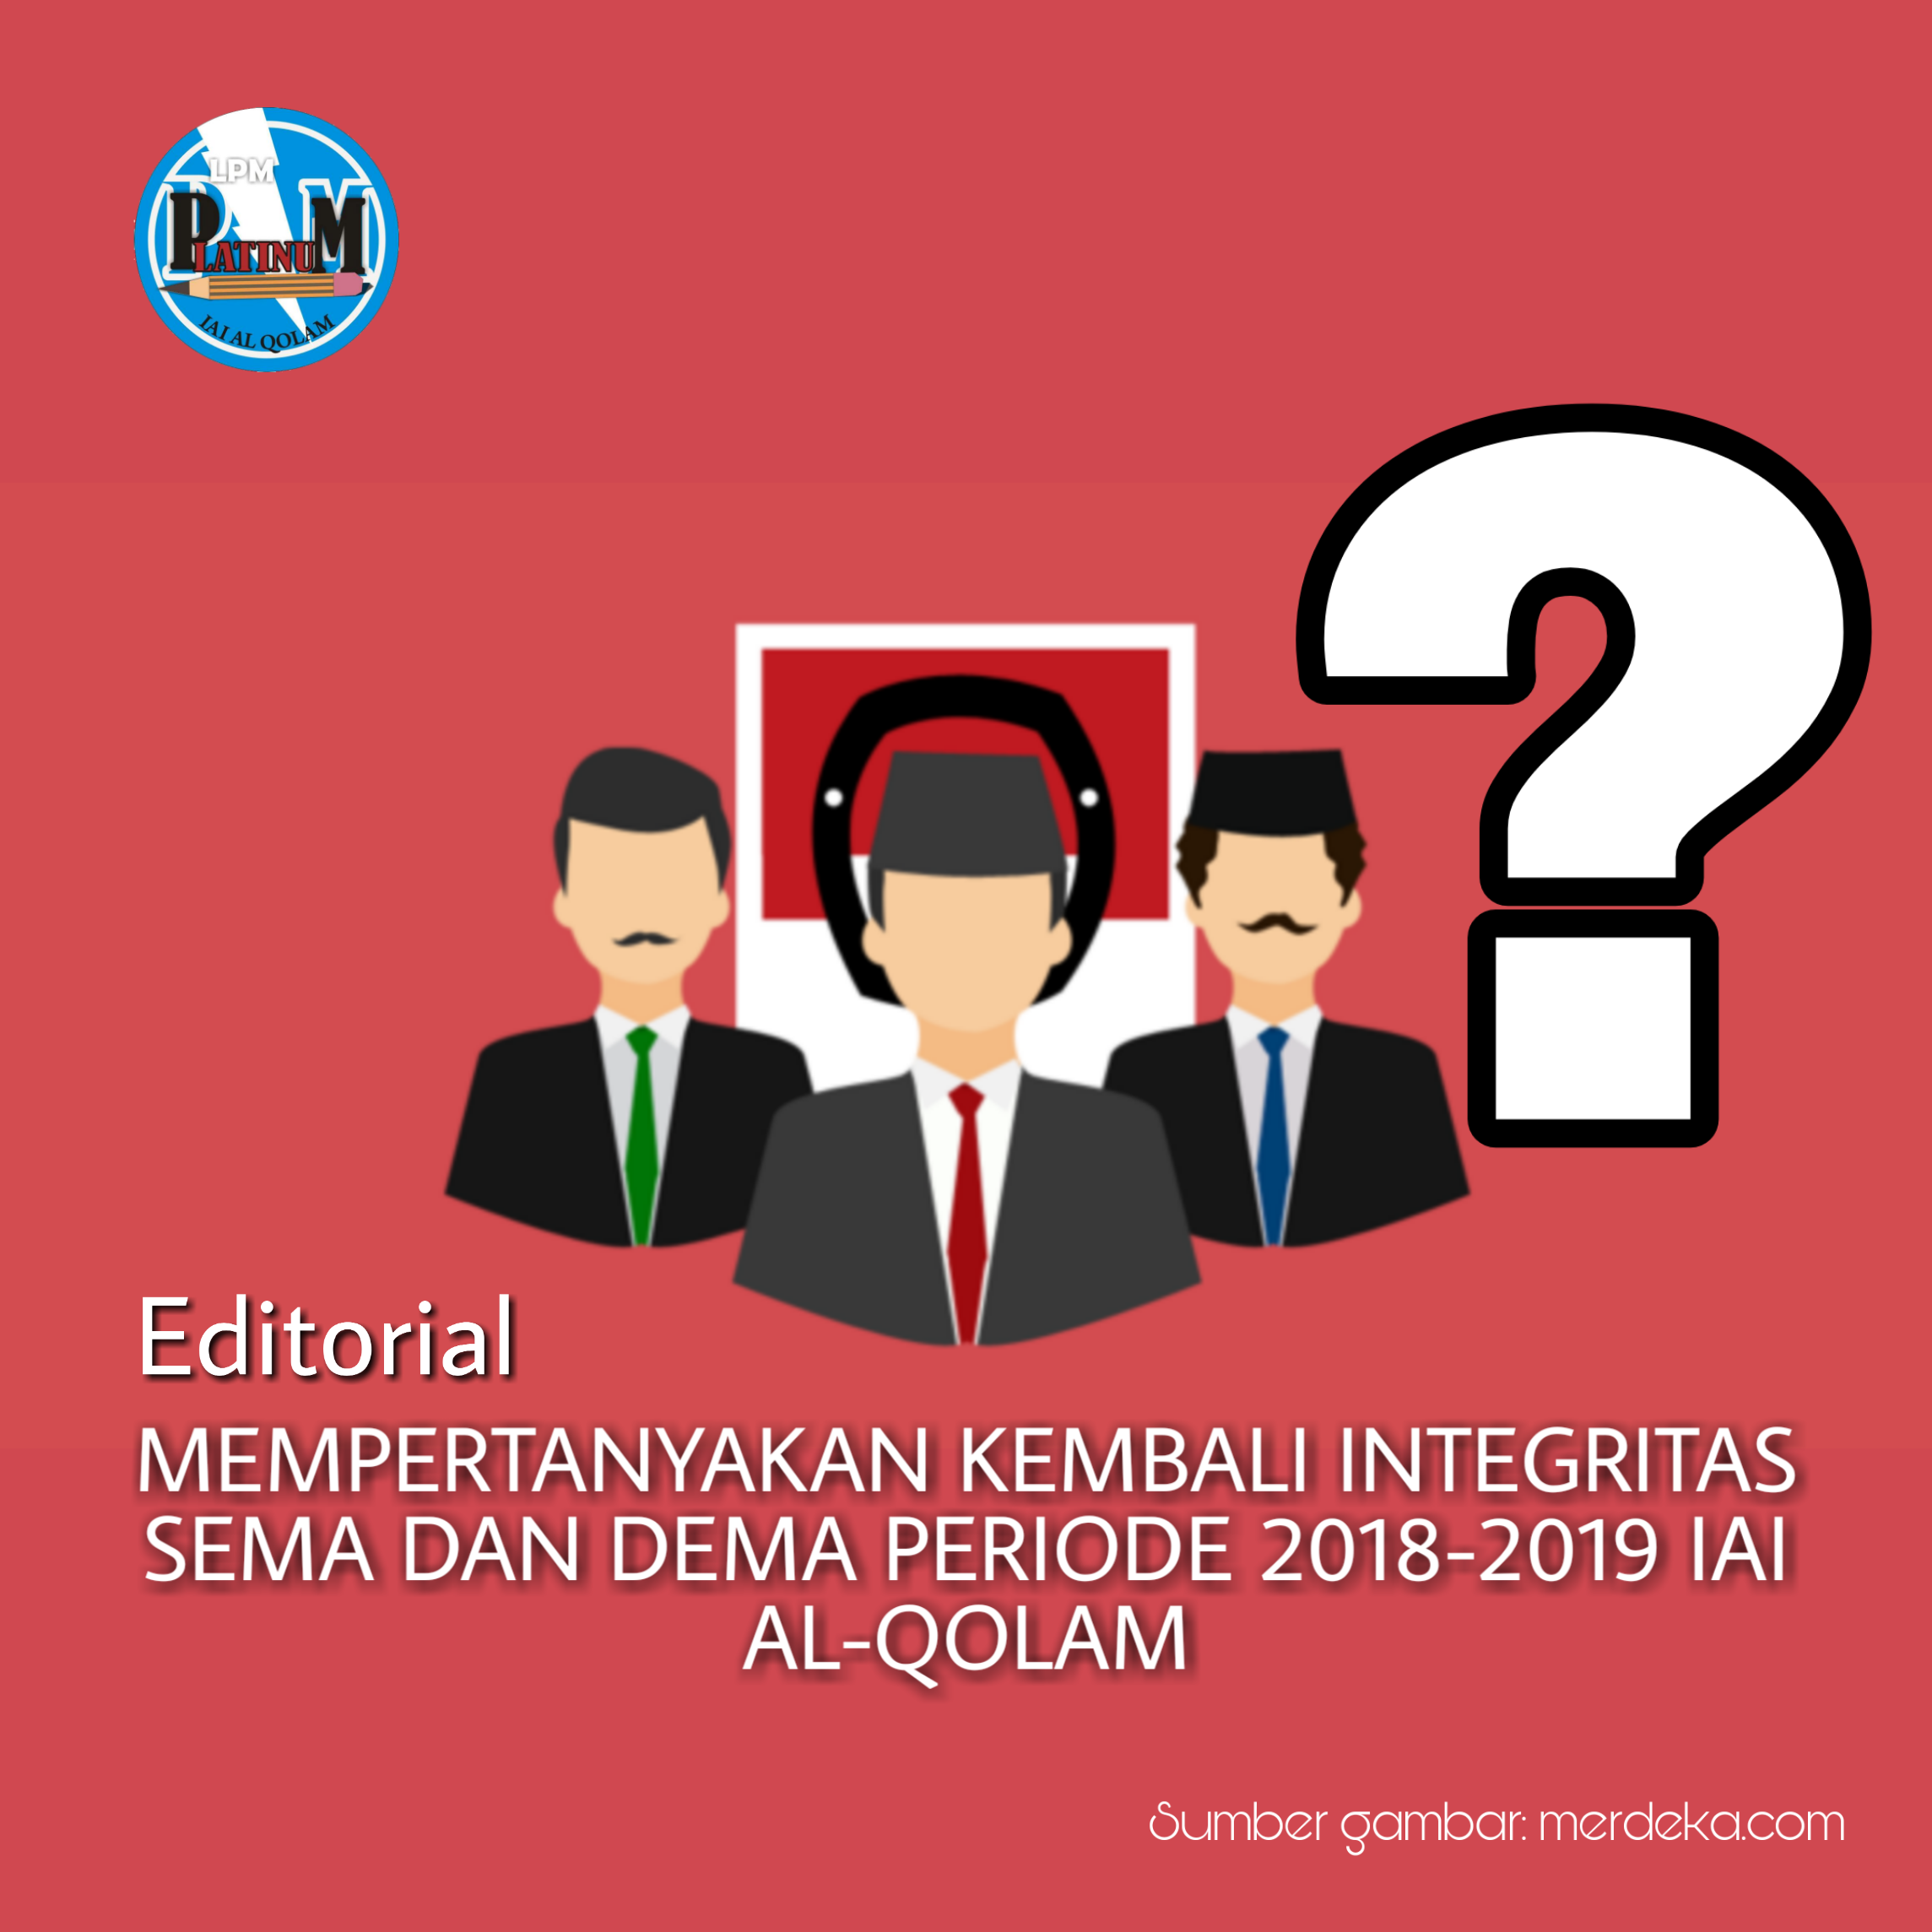 Mempertanyakan Kembali Integritas SEMA dan DEMA IAI Al-Qolam Periode 2018-2019